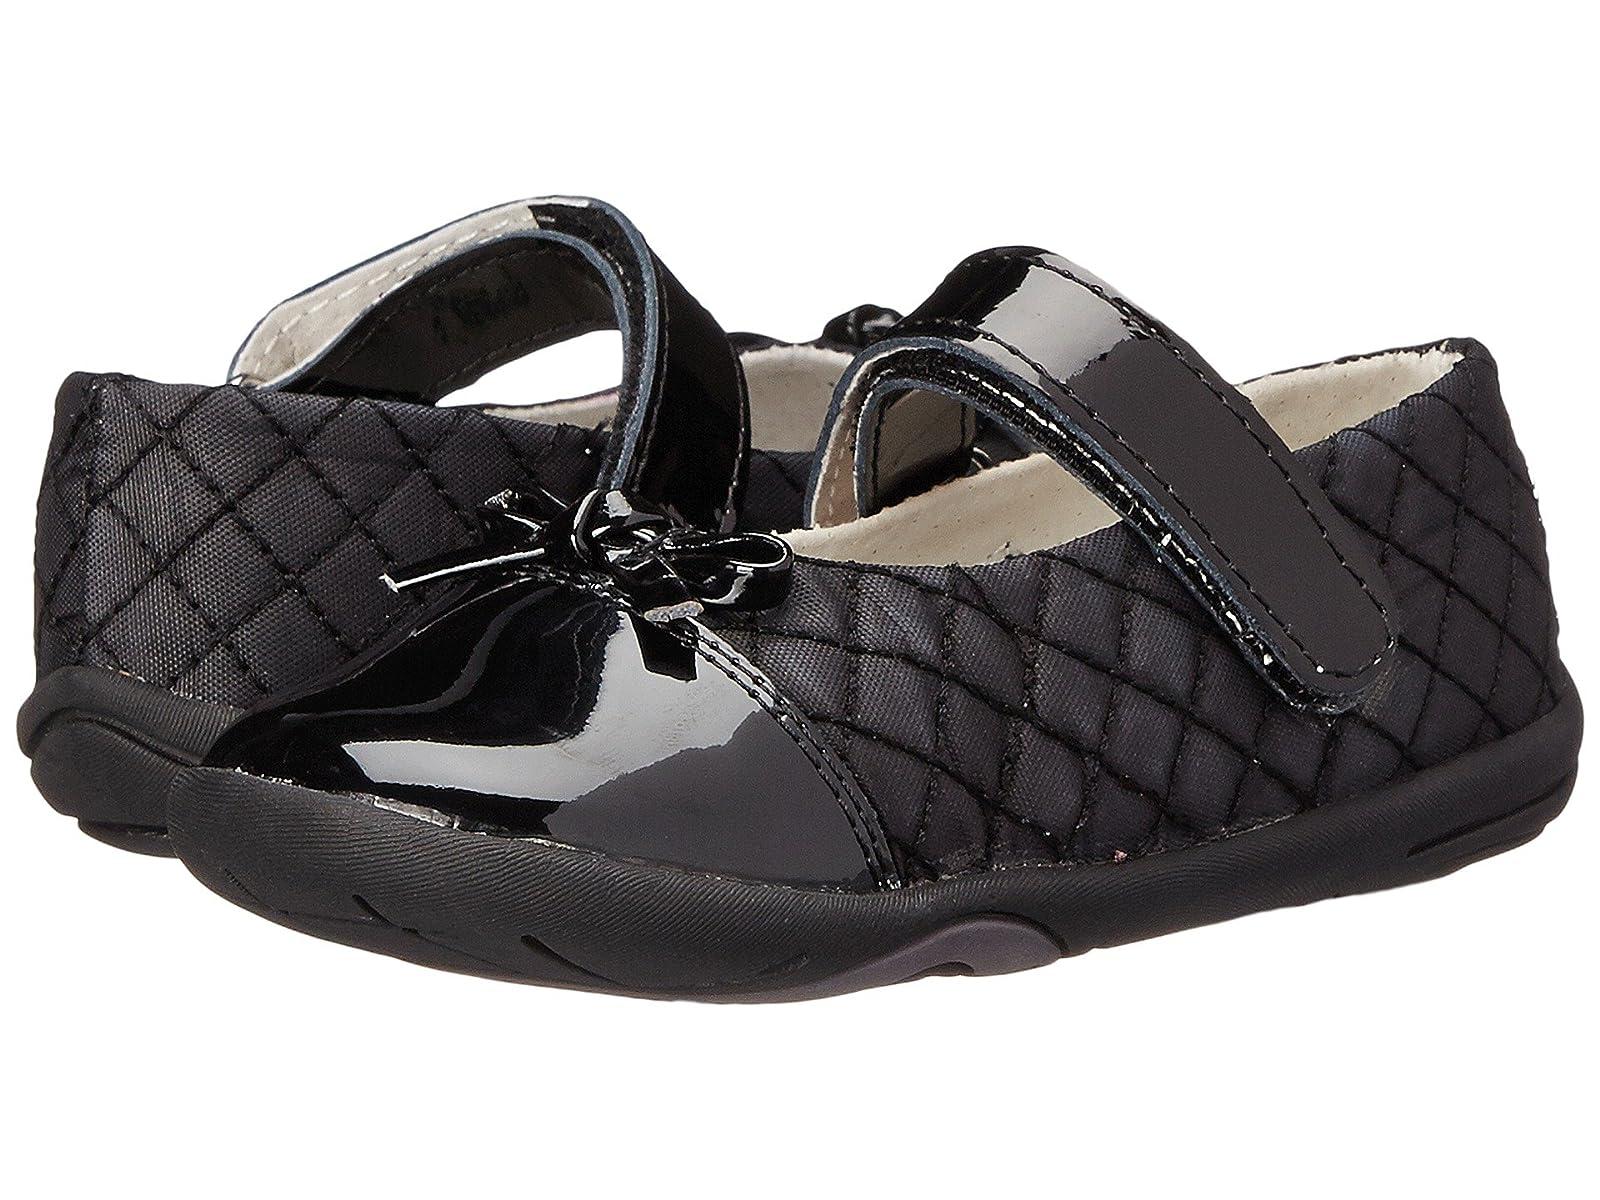 pediped Naomi Grip 'n' Go (Infant/Toddler)Atmospheric grades have affordable shoes